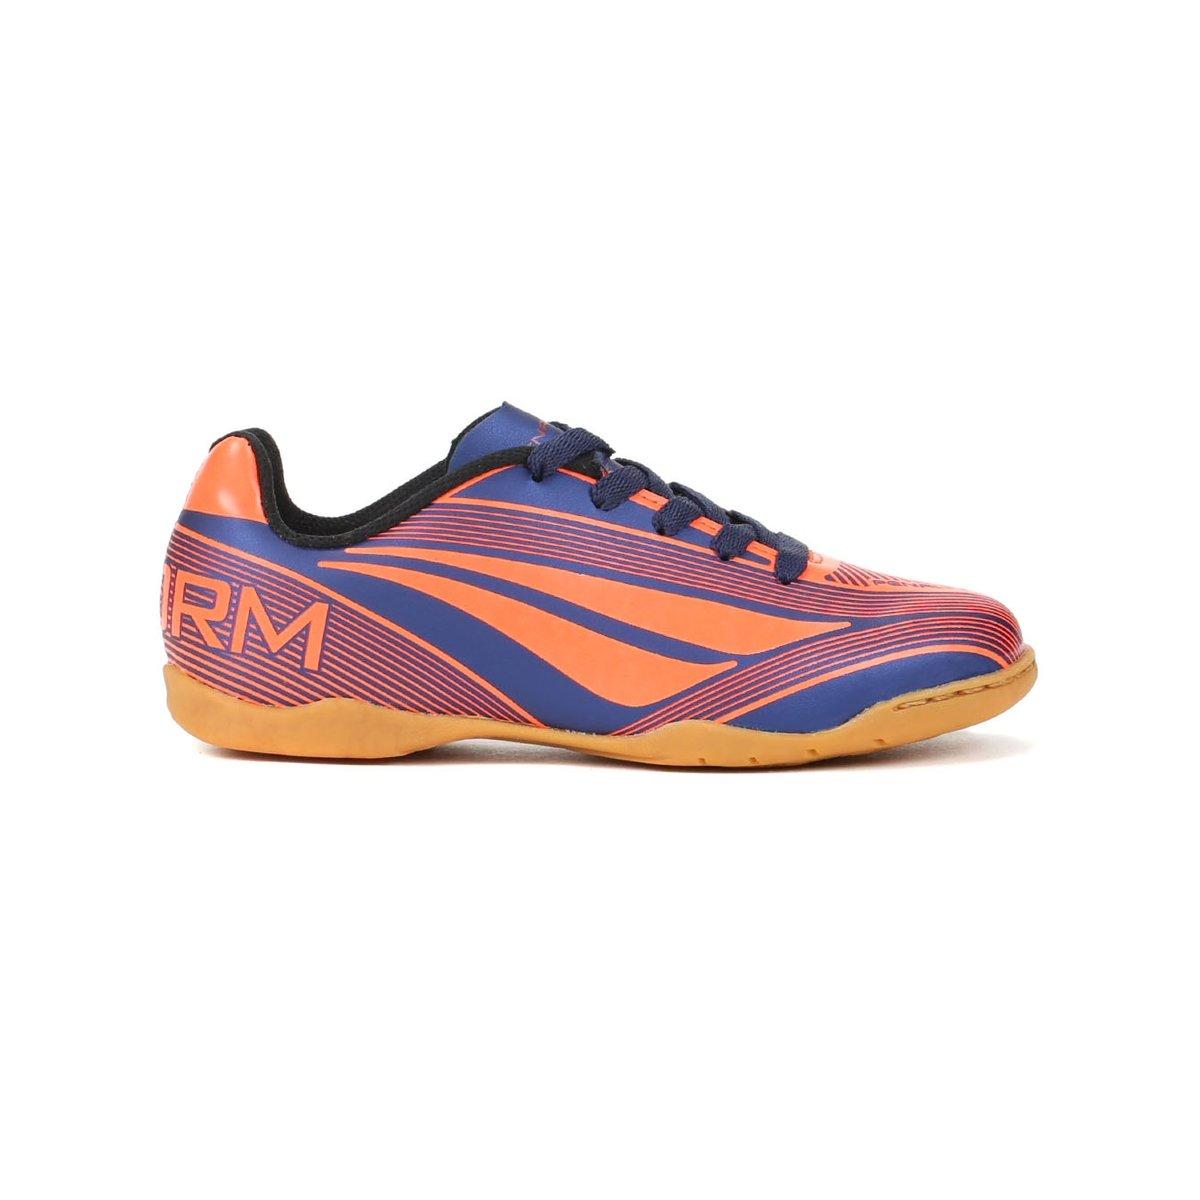 796b04cdc0 ... Tênis Infantil Futsal Para Menino Penalty Storm Vi - Coral azul marinho  ...